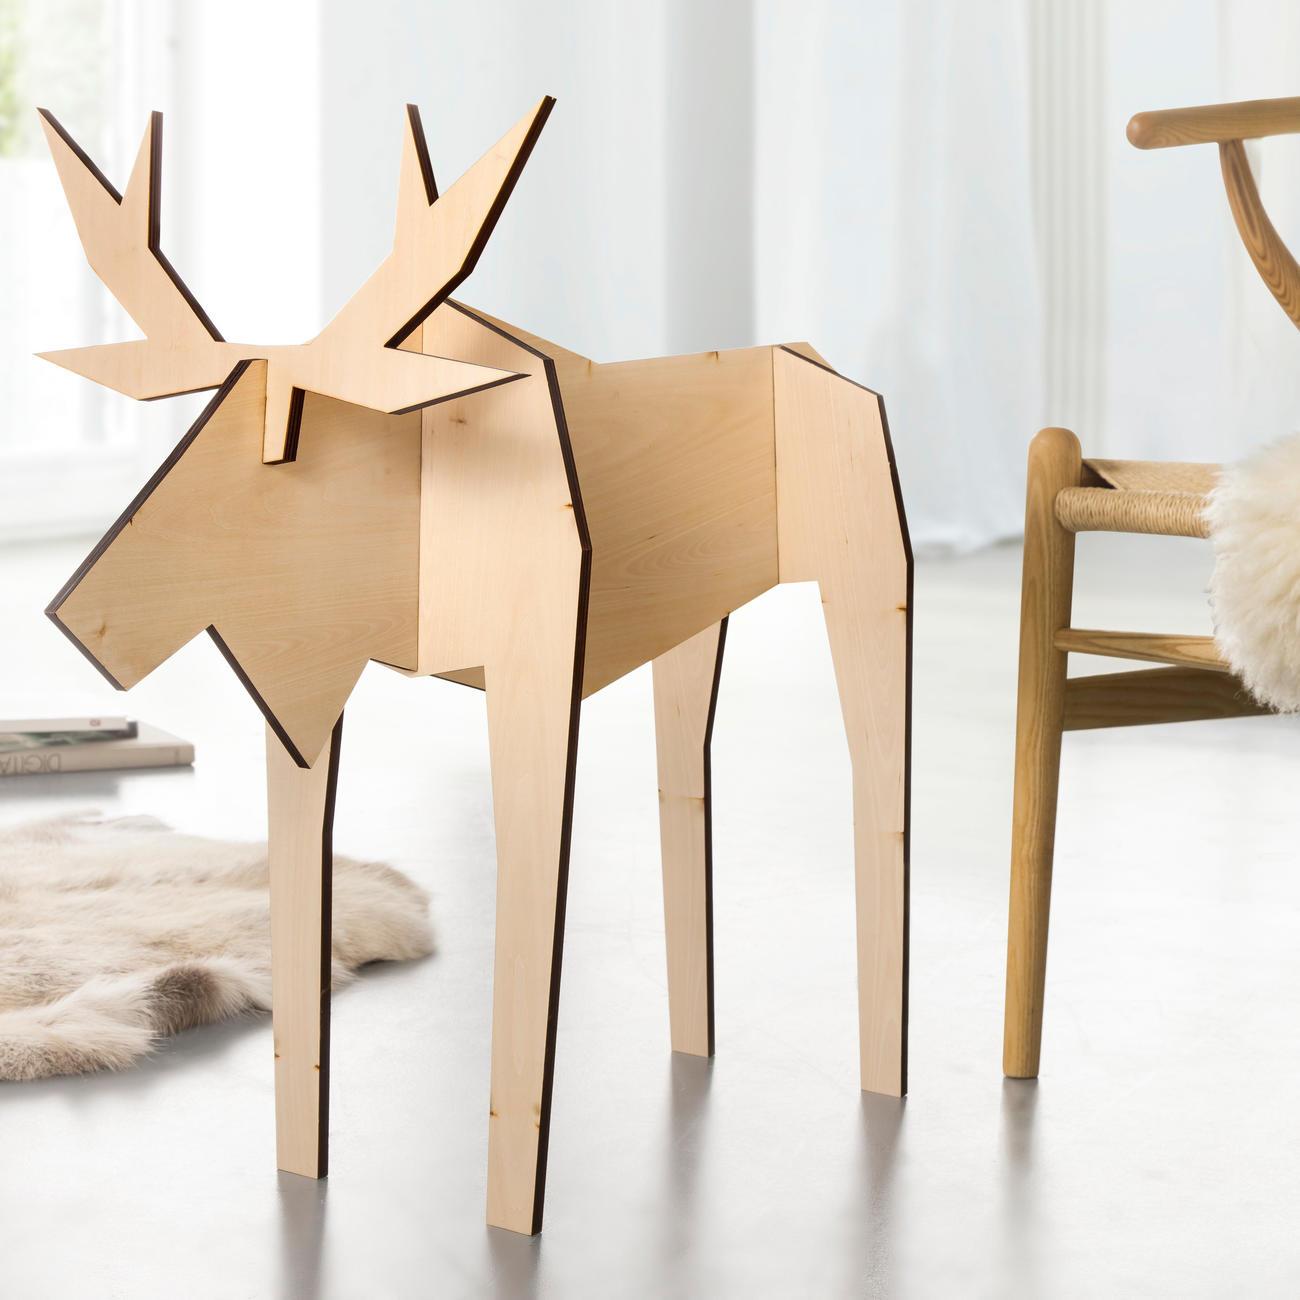 holz elch pierre 3 jahre garantie pro idee. Black Bedroom Furniture Sets. Home Design Ideas